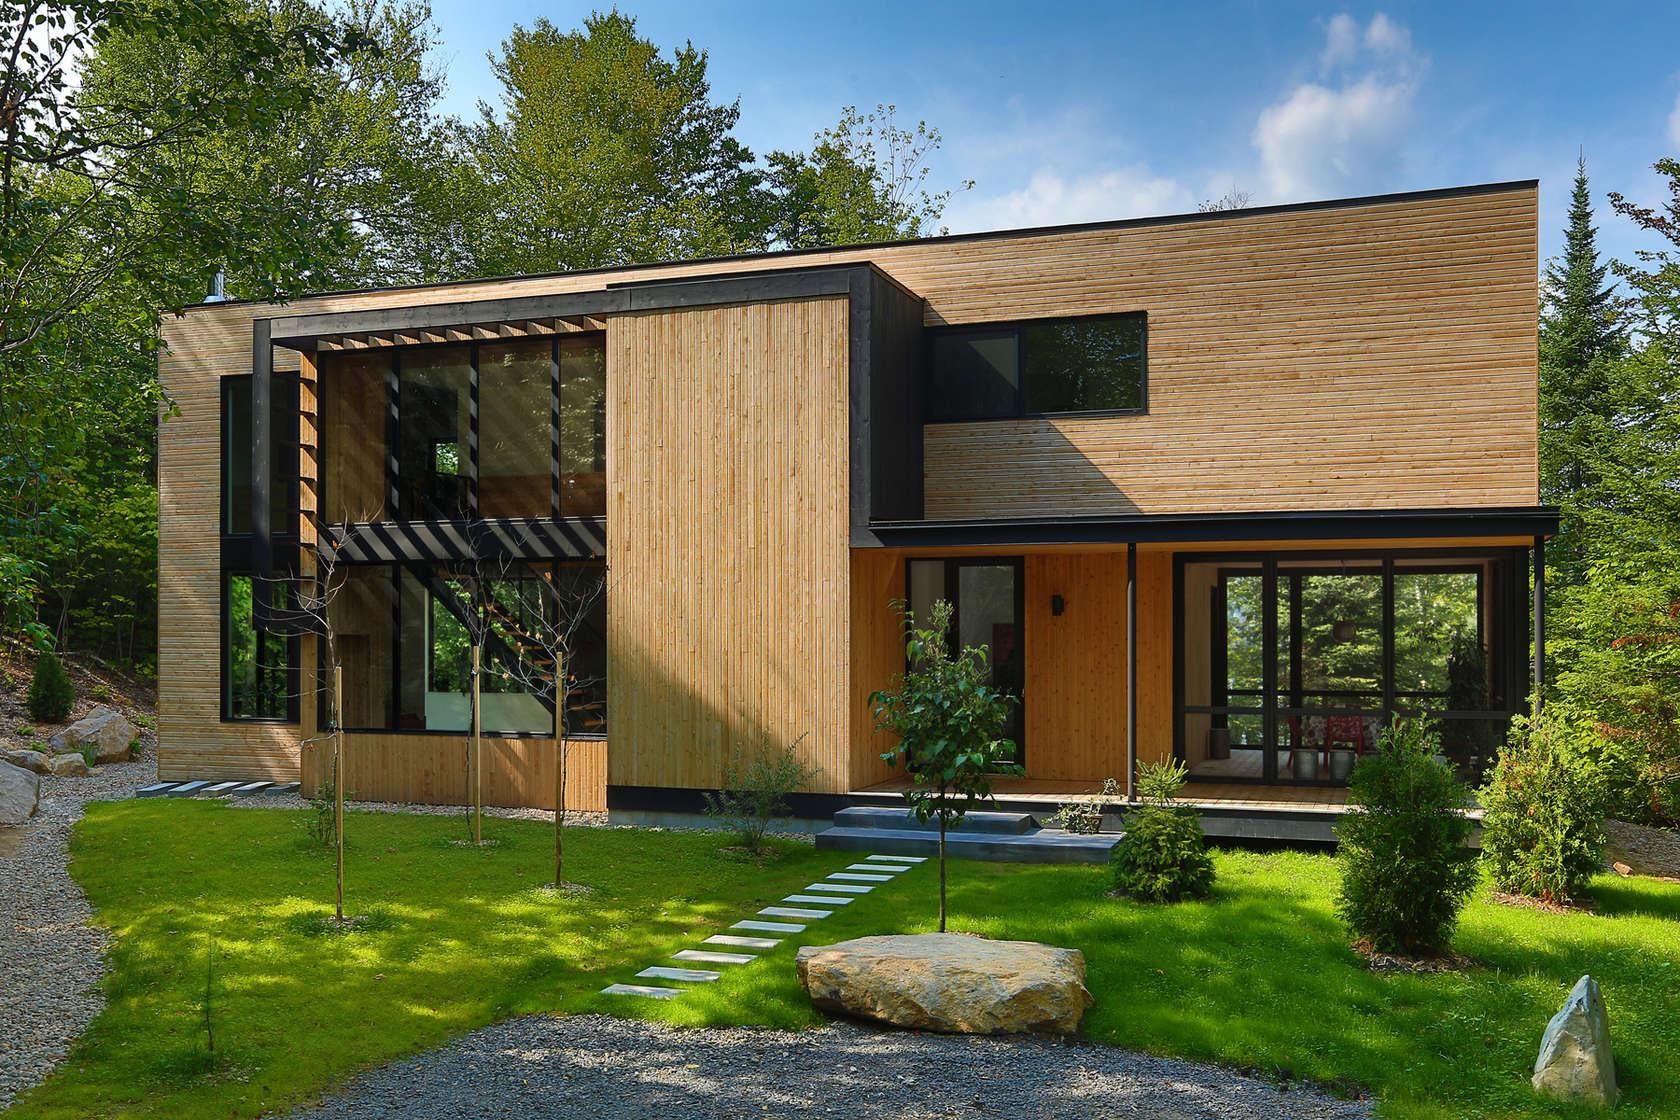 дизайн домов фото снаружи и внутри